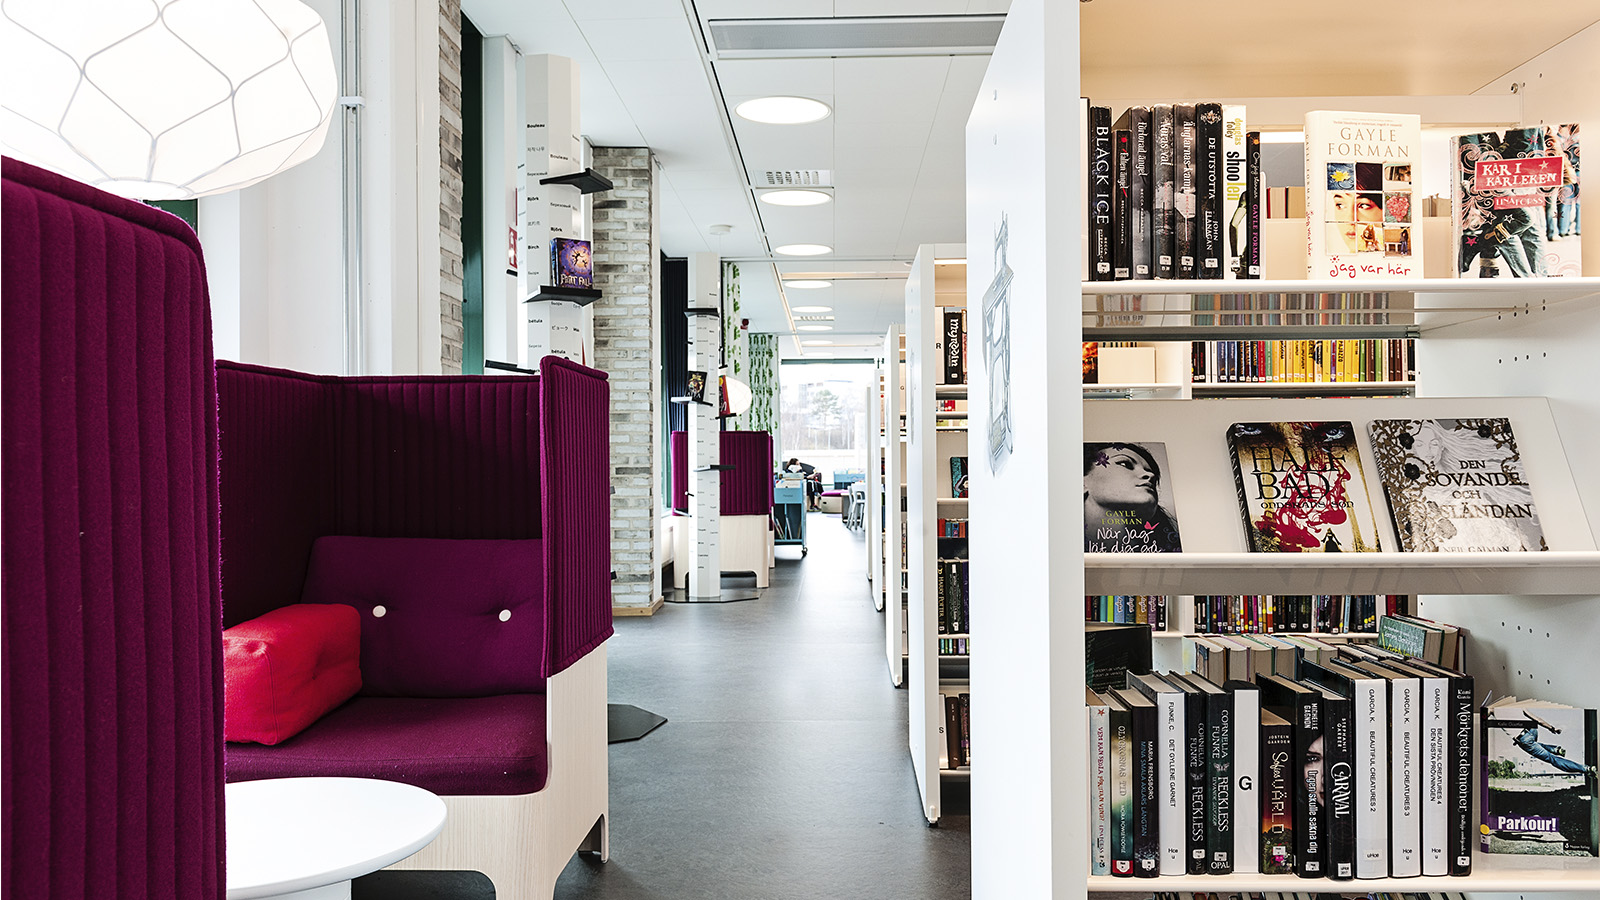 Husqvarna public library, Sweden